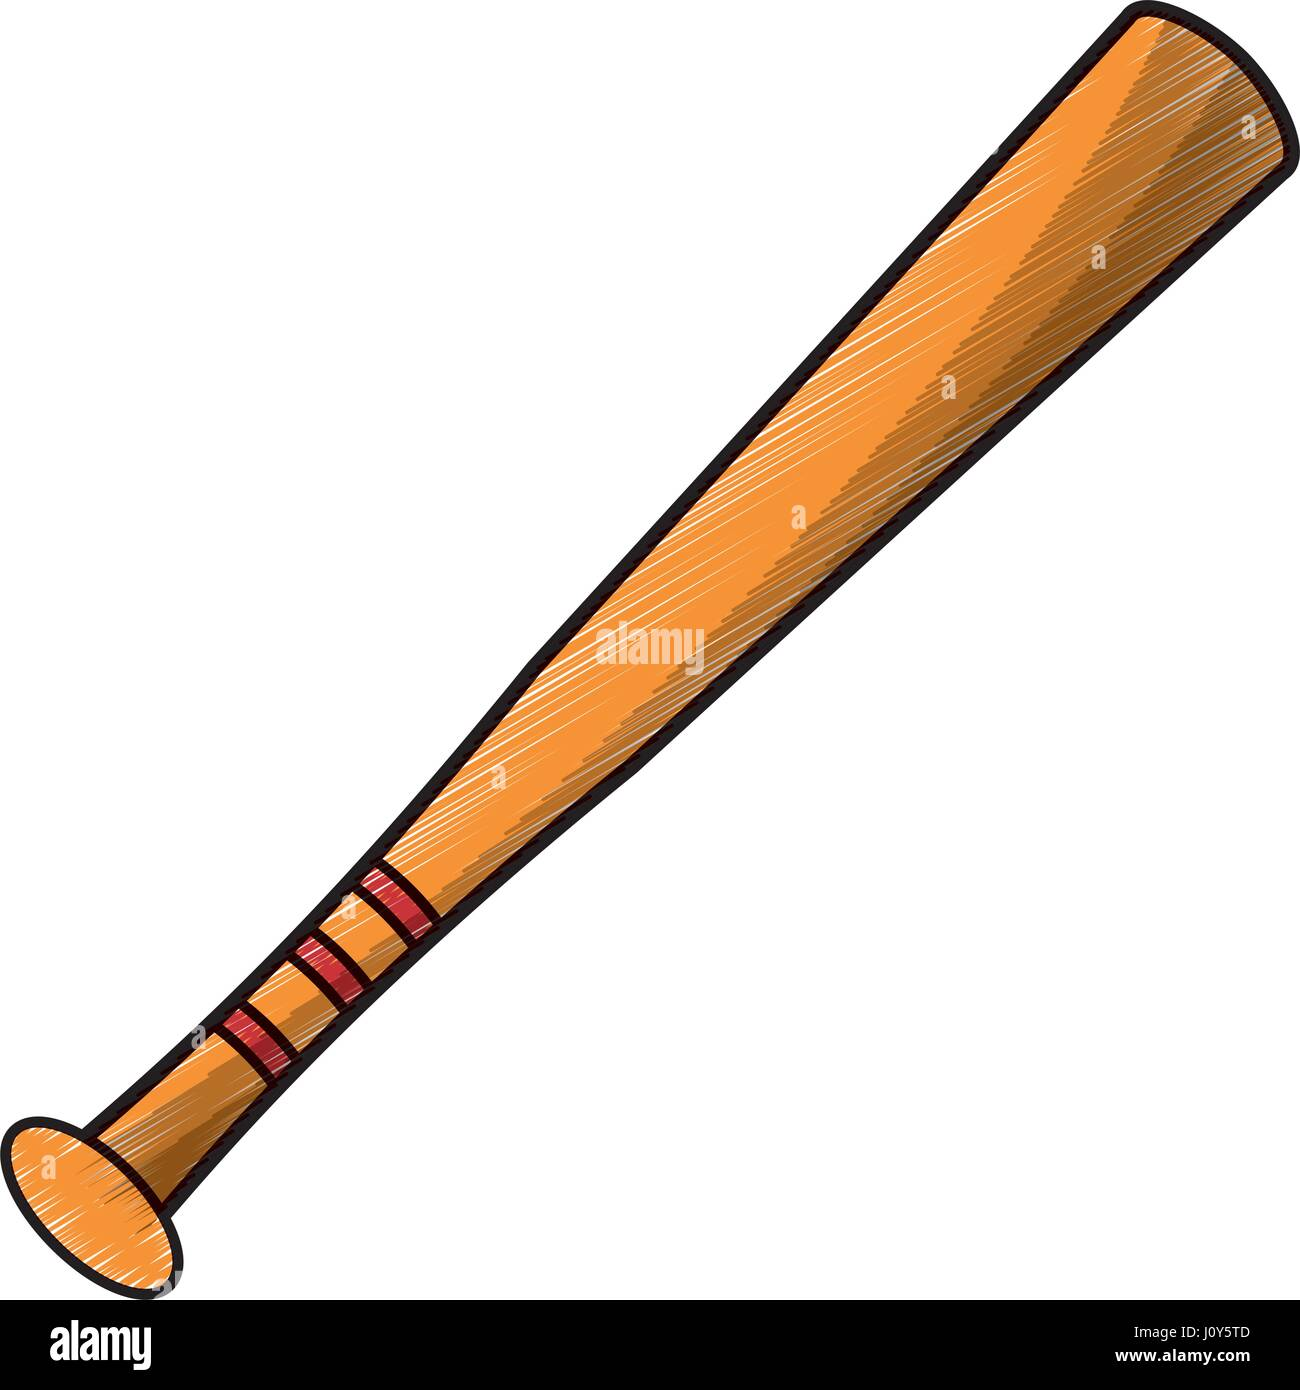 drawing bat baseball equipment stock vector art illustration rh alamy com Baseball Bat and Ball Baseball Bat Clip Art